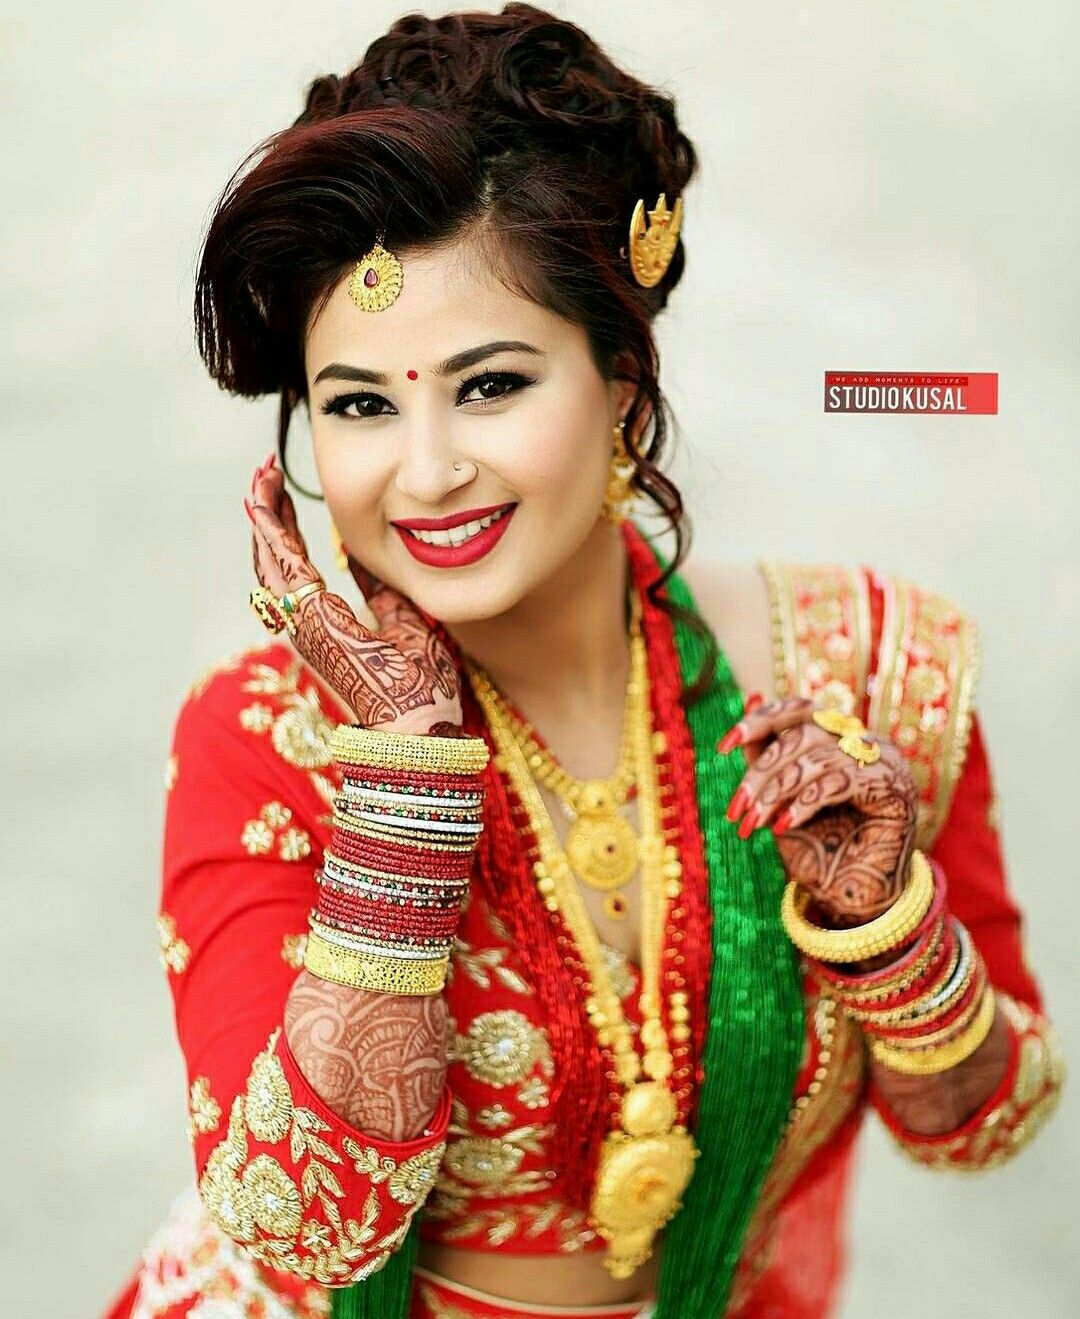 nepali #wedding #tradition #nepal #marriage #bride #makeup